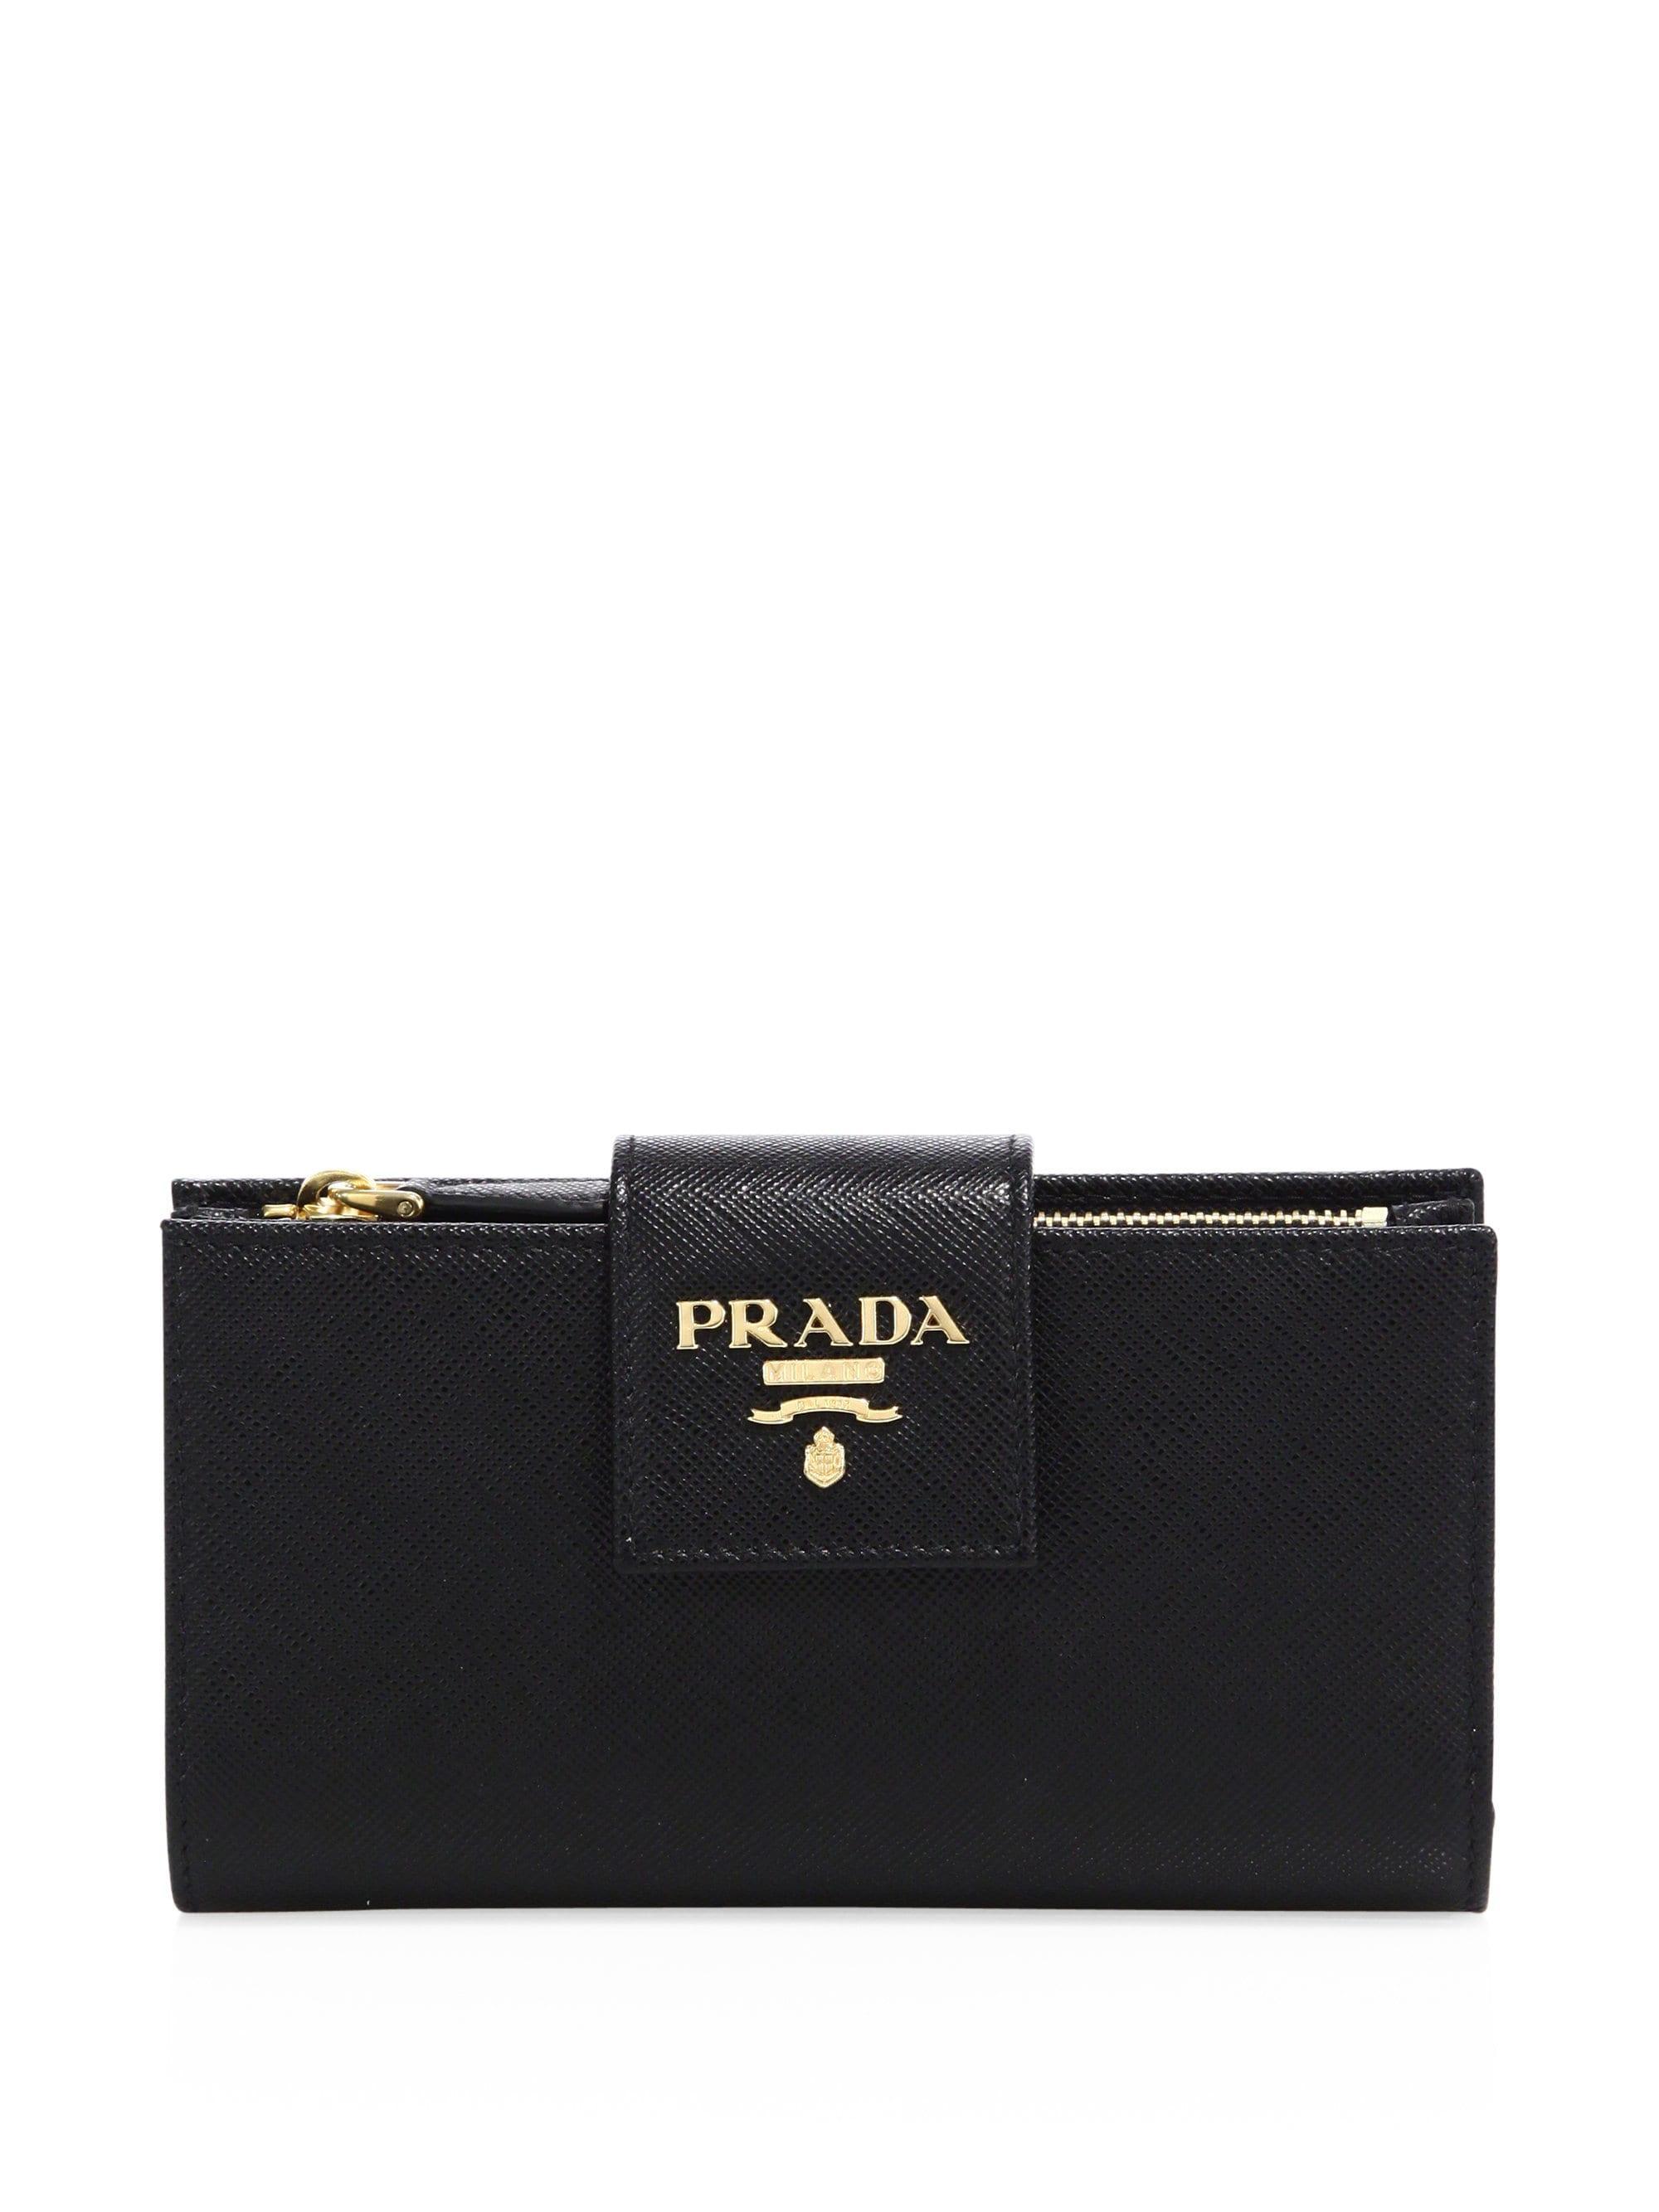 dcfefdc759af Lyst - Prada Women s Saffiano Leather Tab Wallet - Black in Black